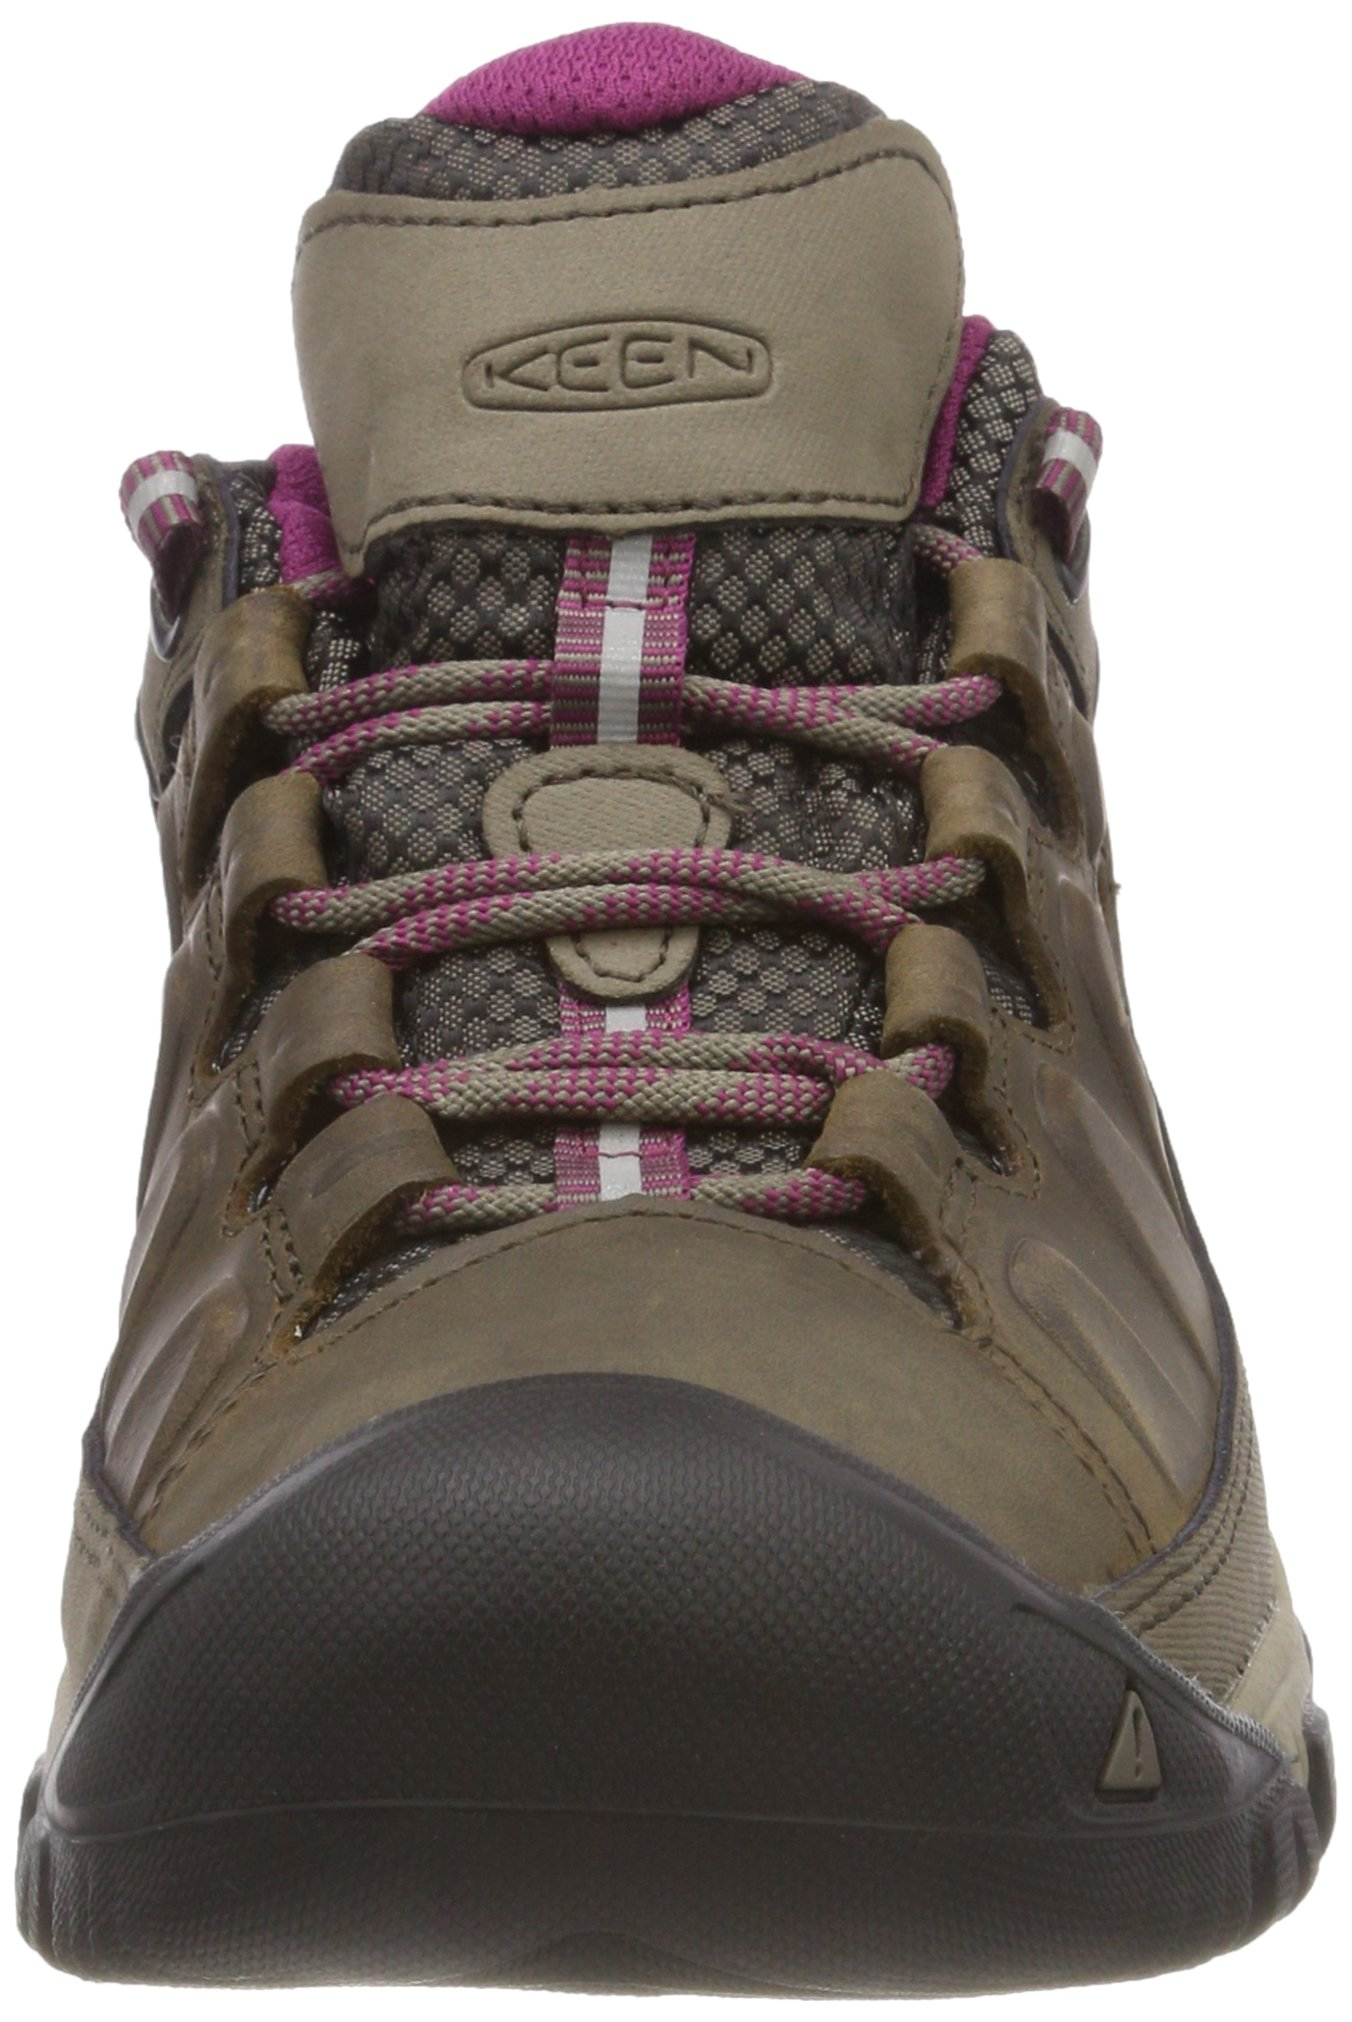 81SY8HkVlXL - KEEN Women's Targhee Iii Wp Low Rise Hiking Shoes, 9